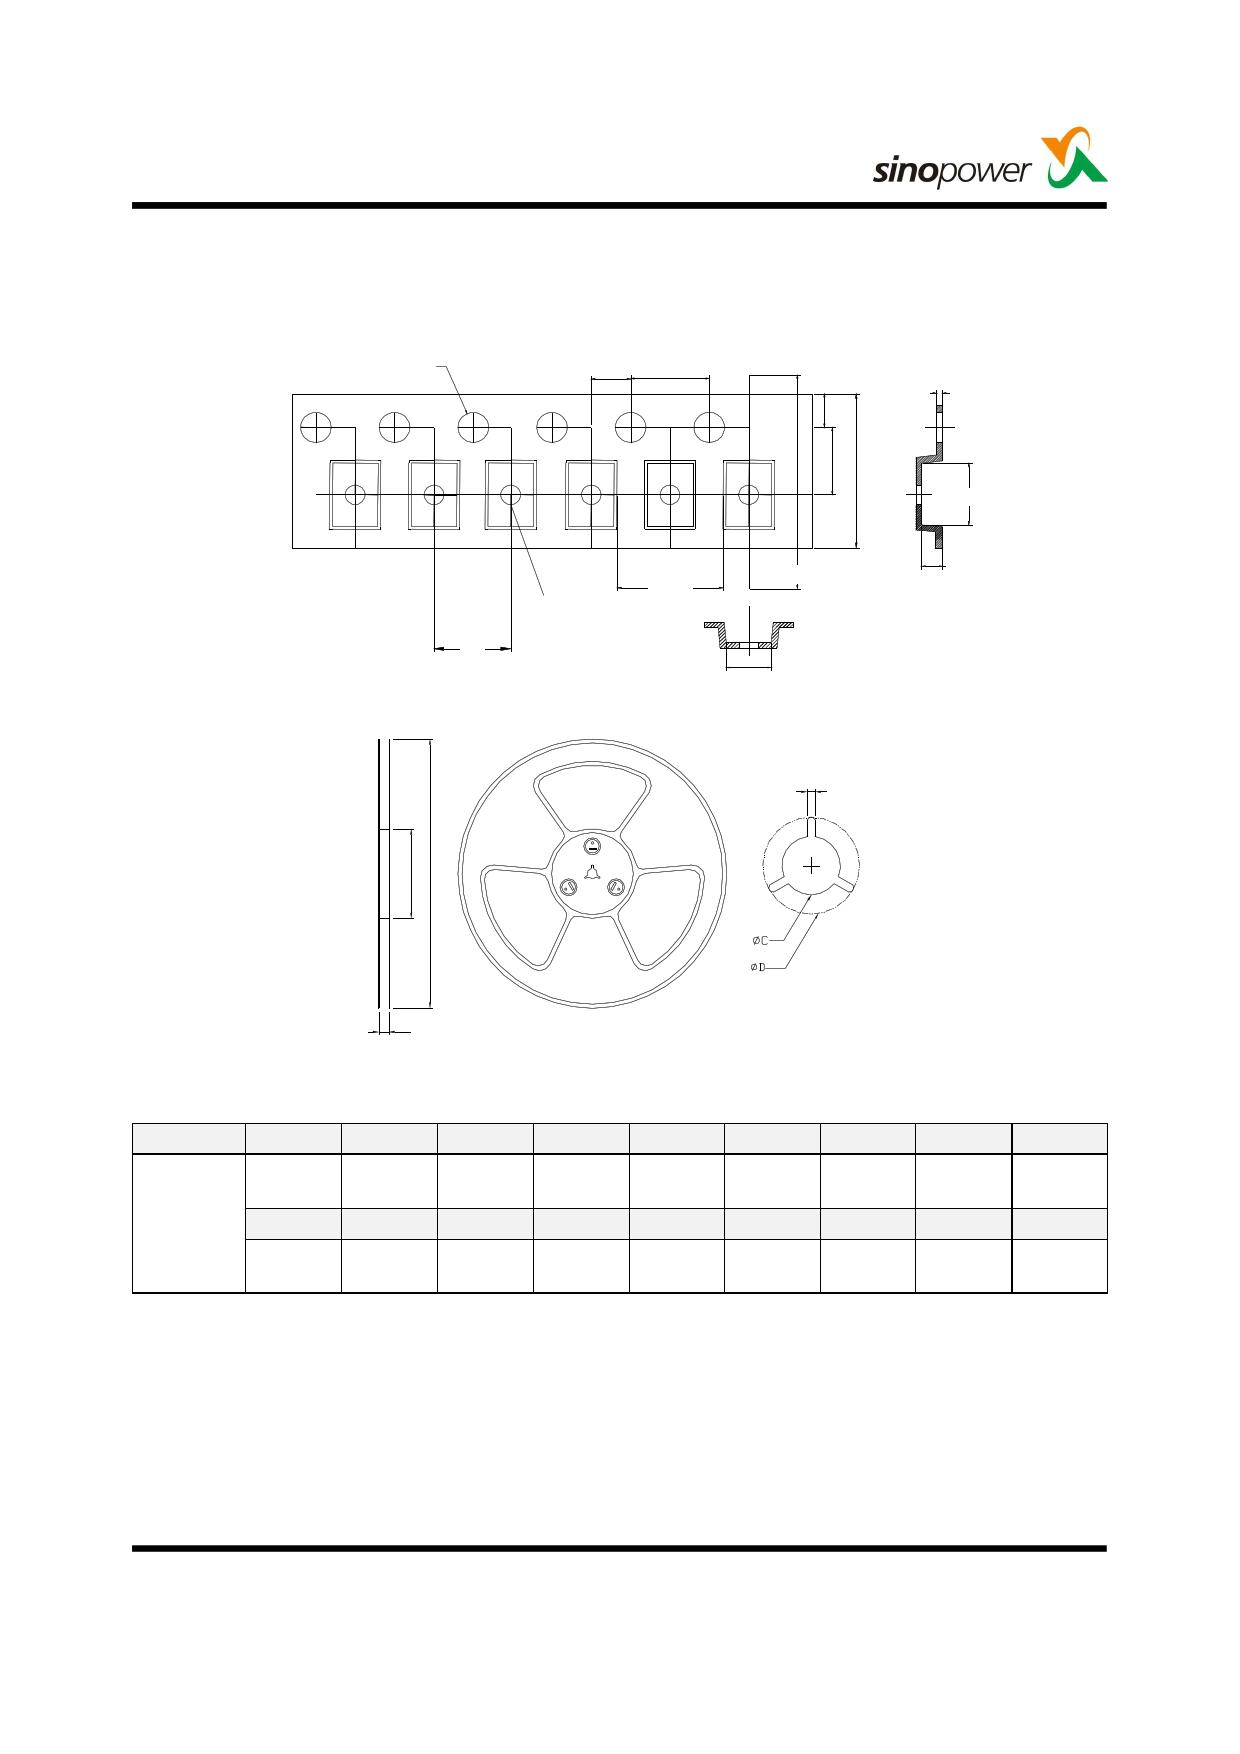 SM9993DSQG diode, scr